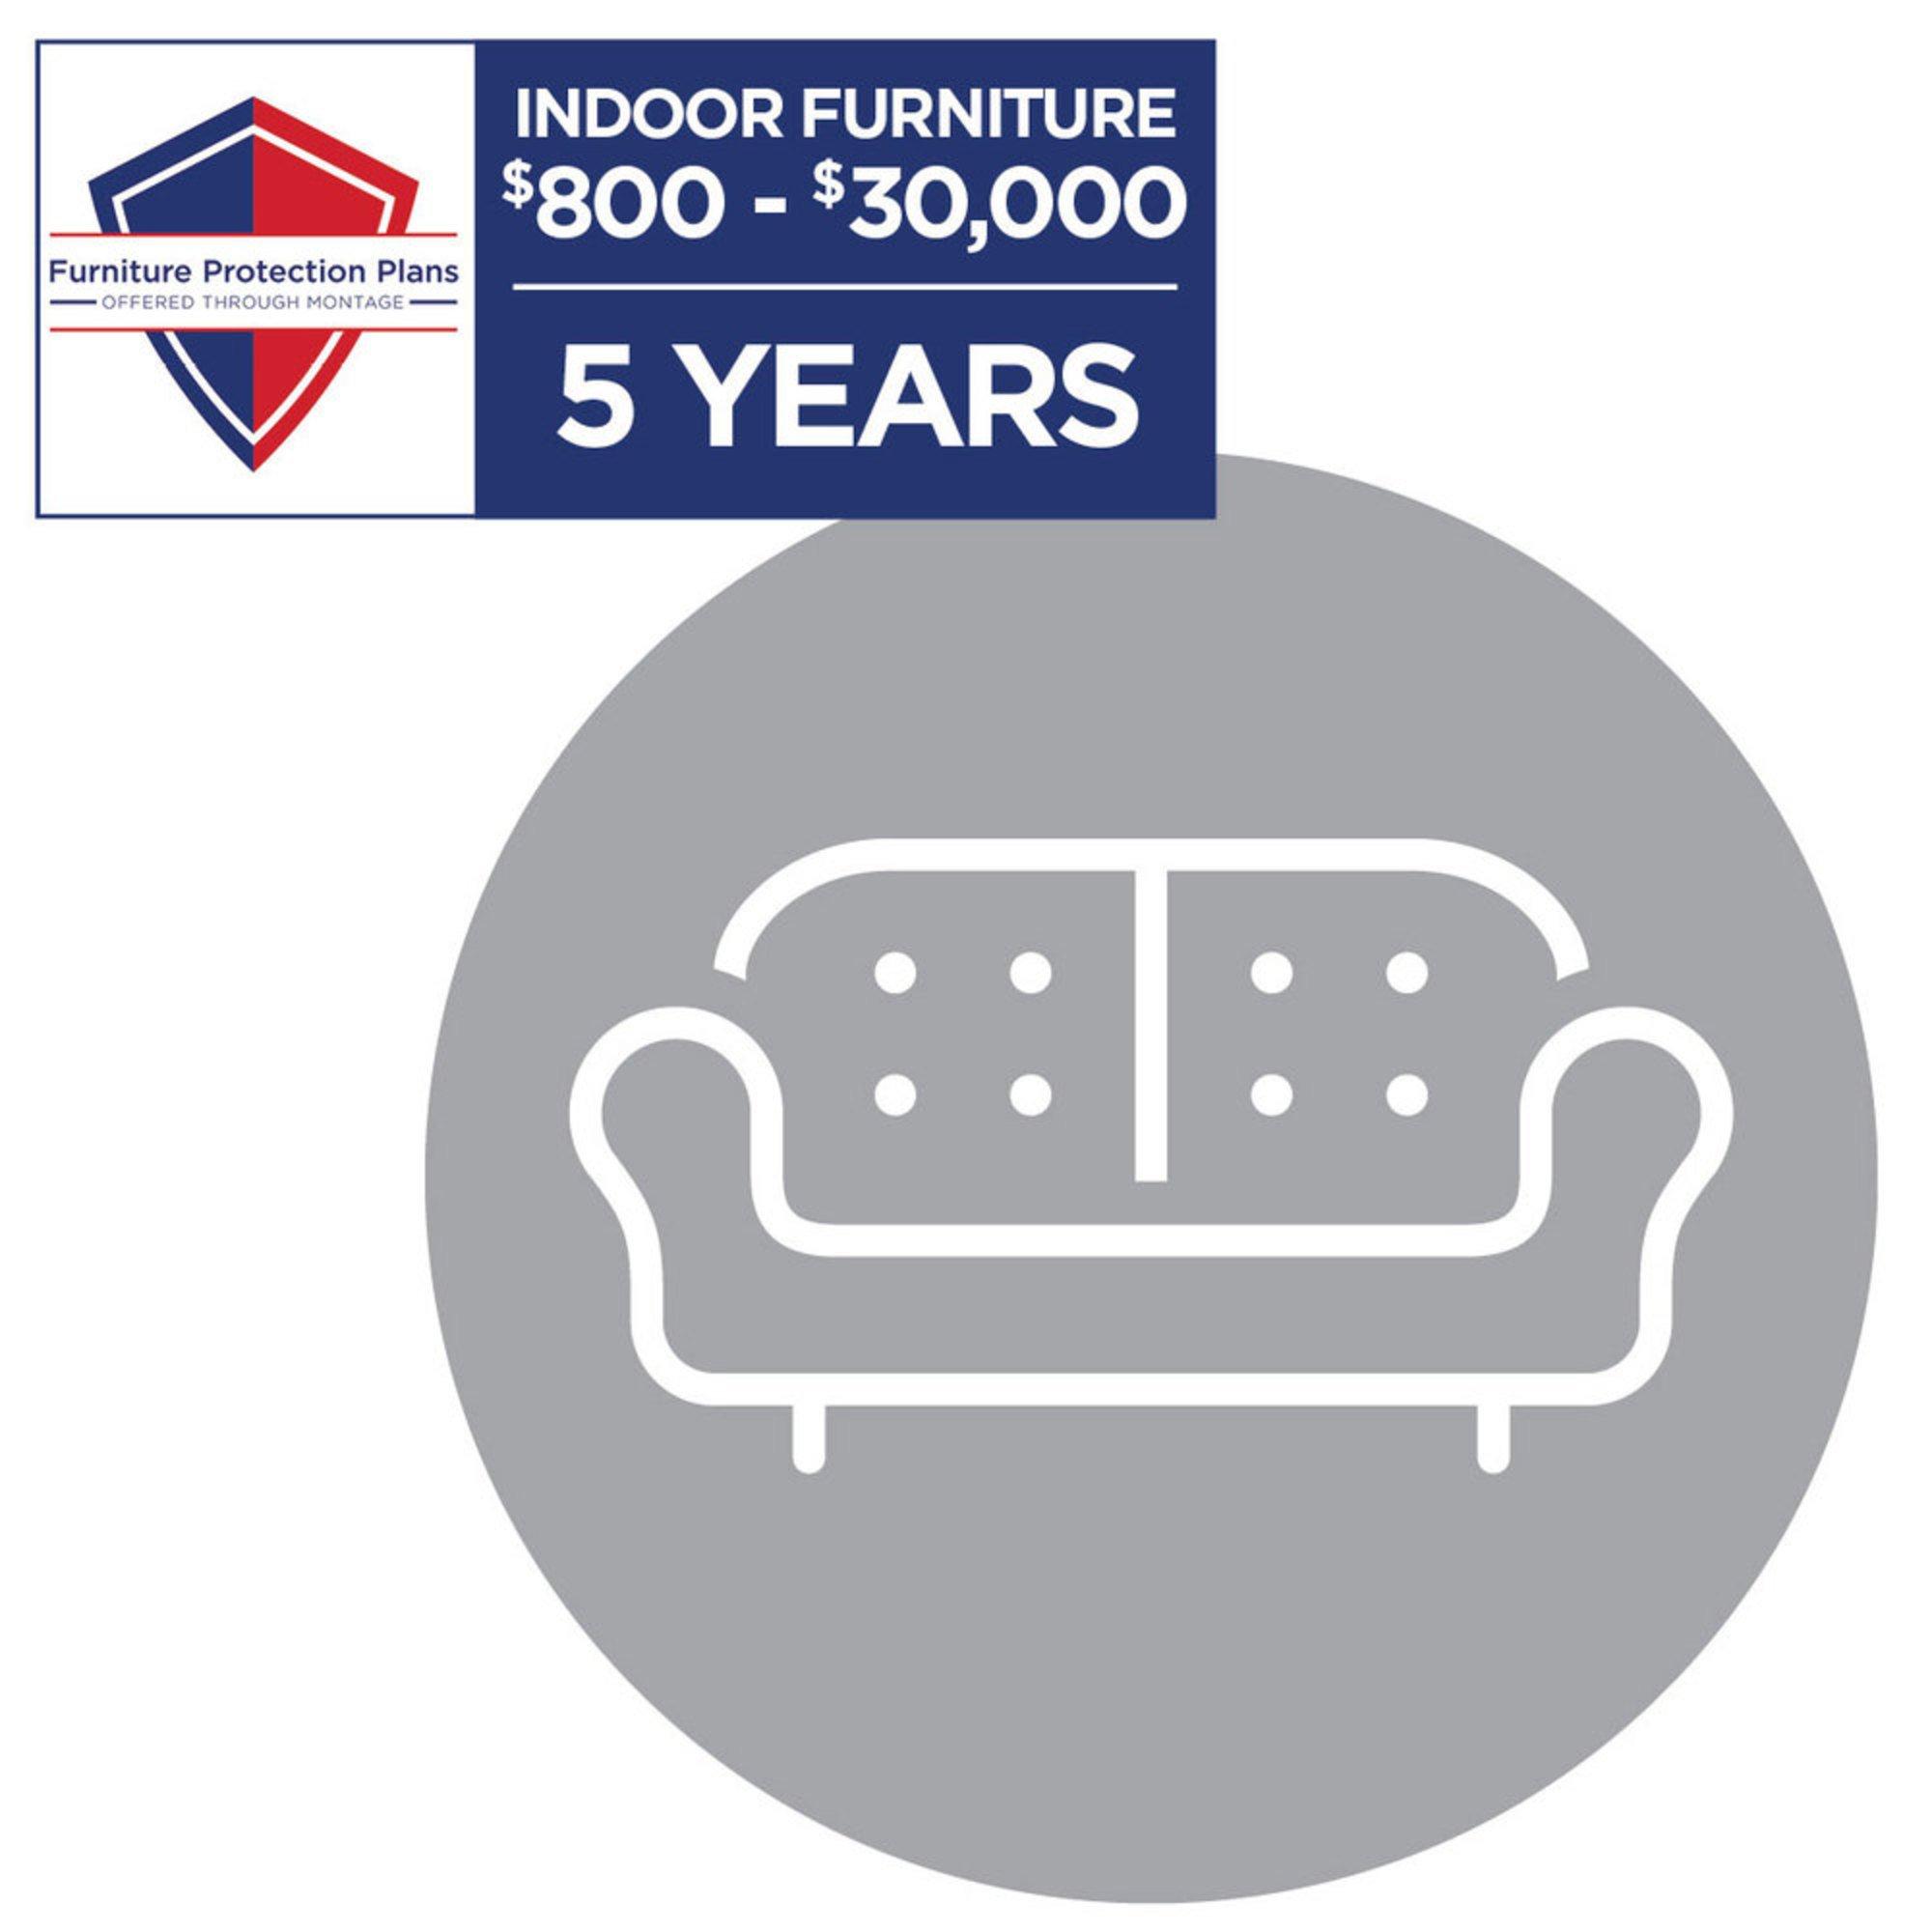 Montage 11 Year Indoor Furniture Plan, $11-$11,11  Montage